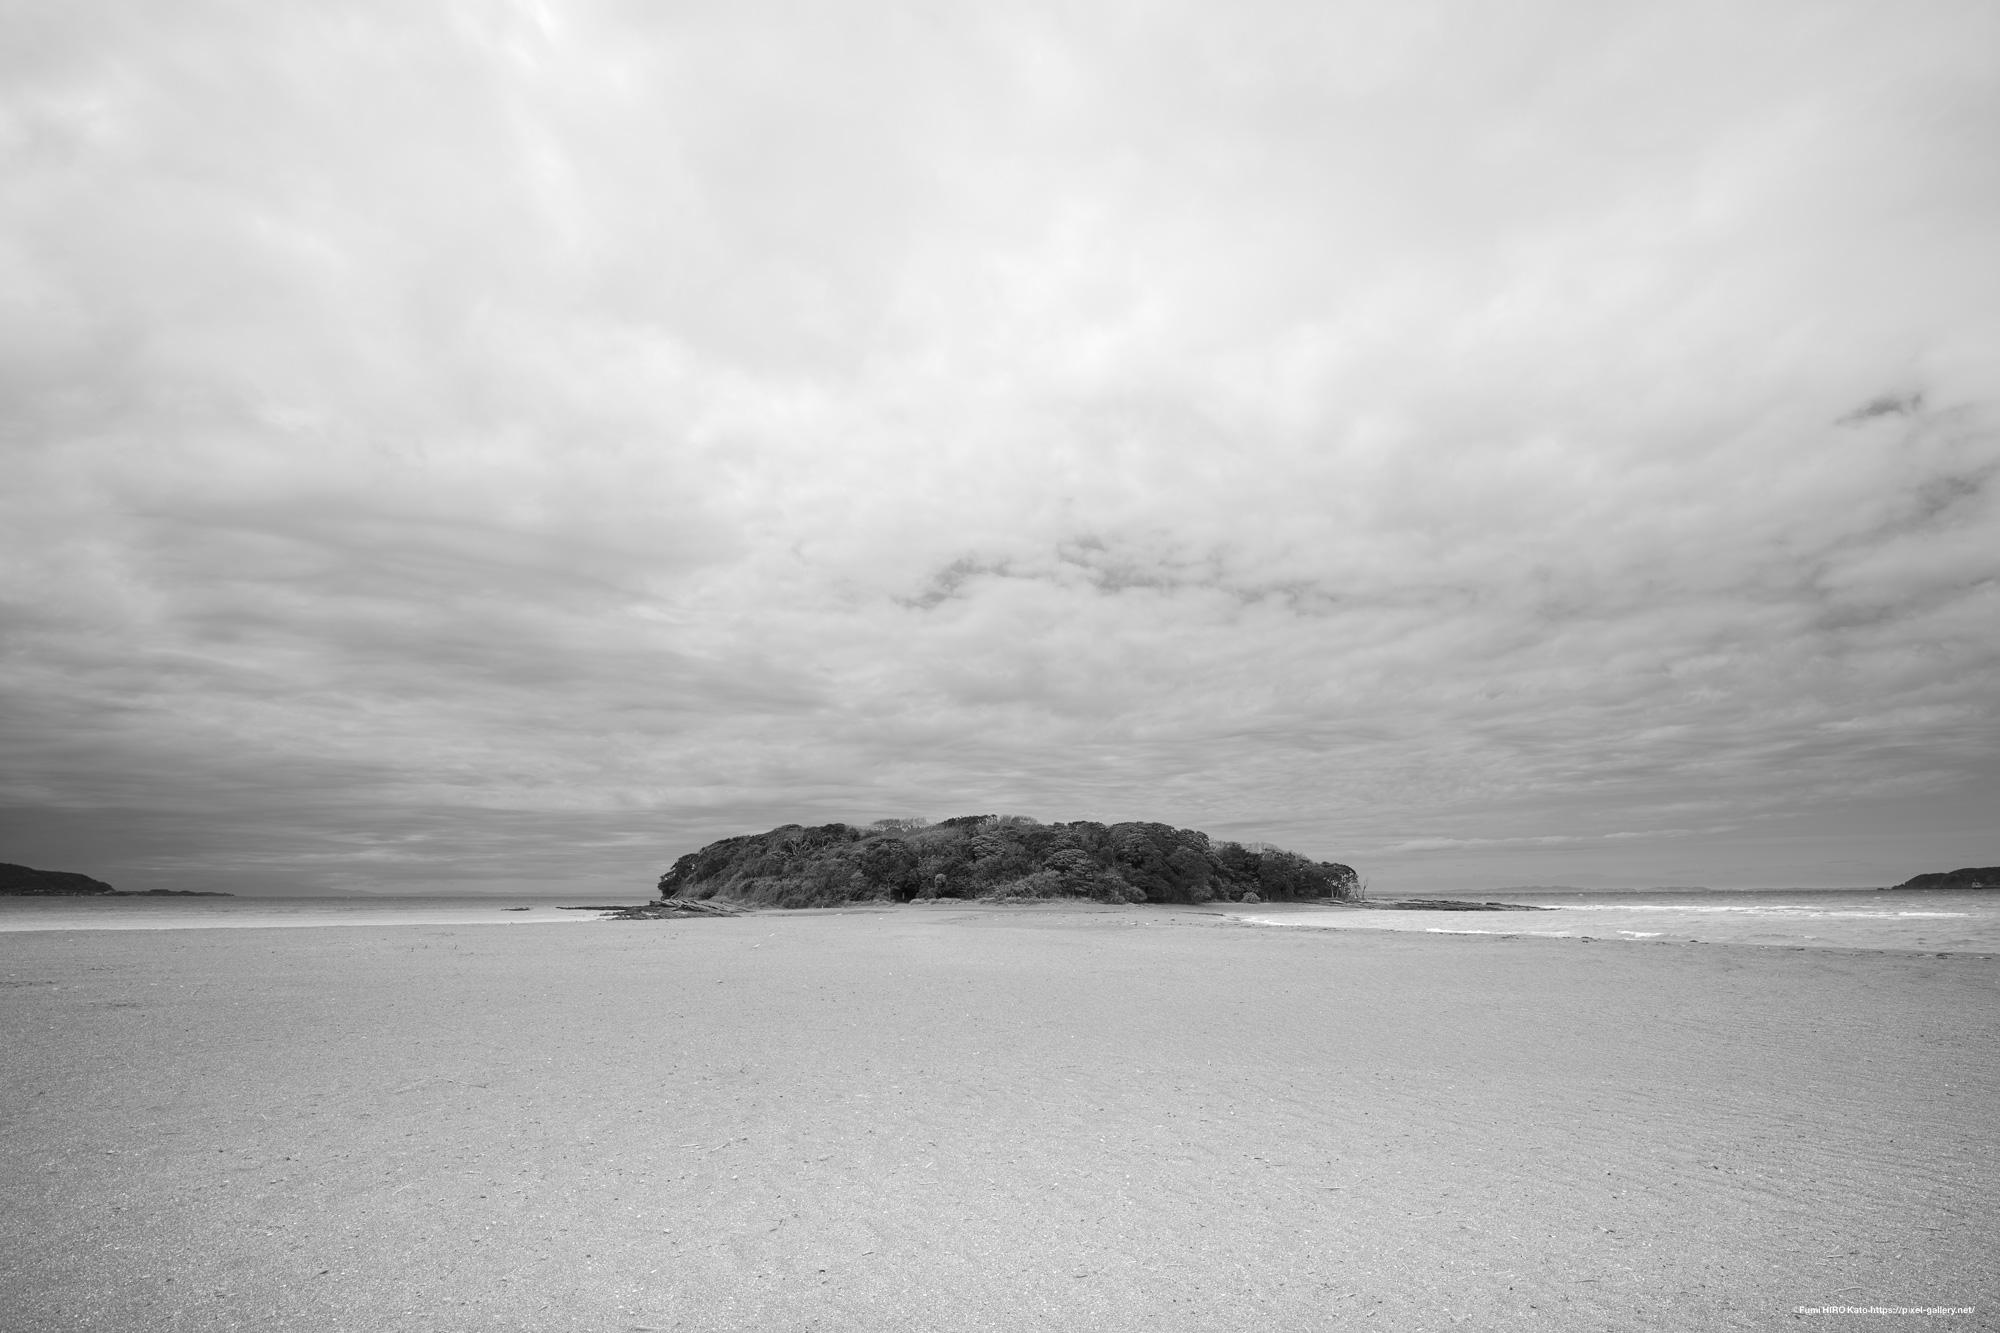 具象を拒絶する海景 19-003